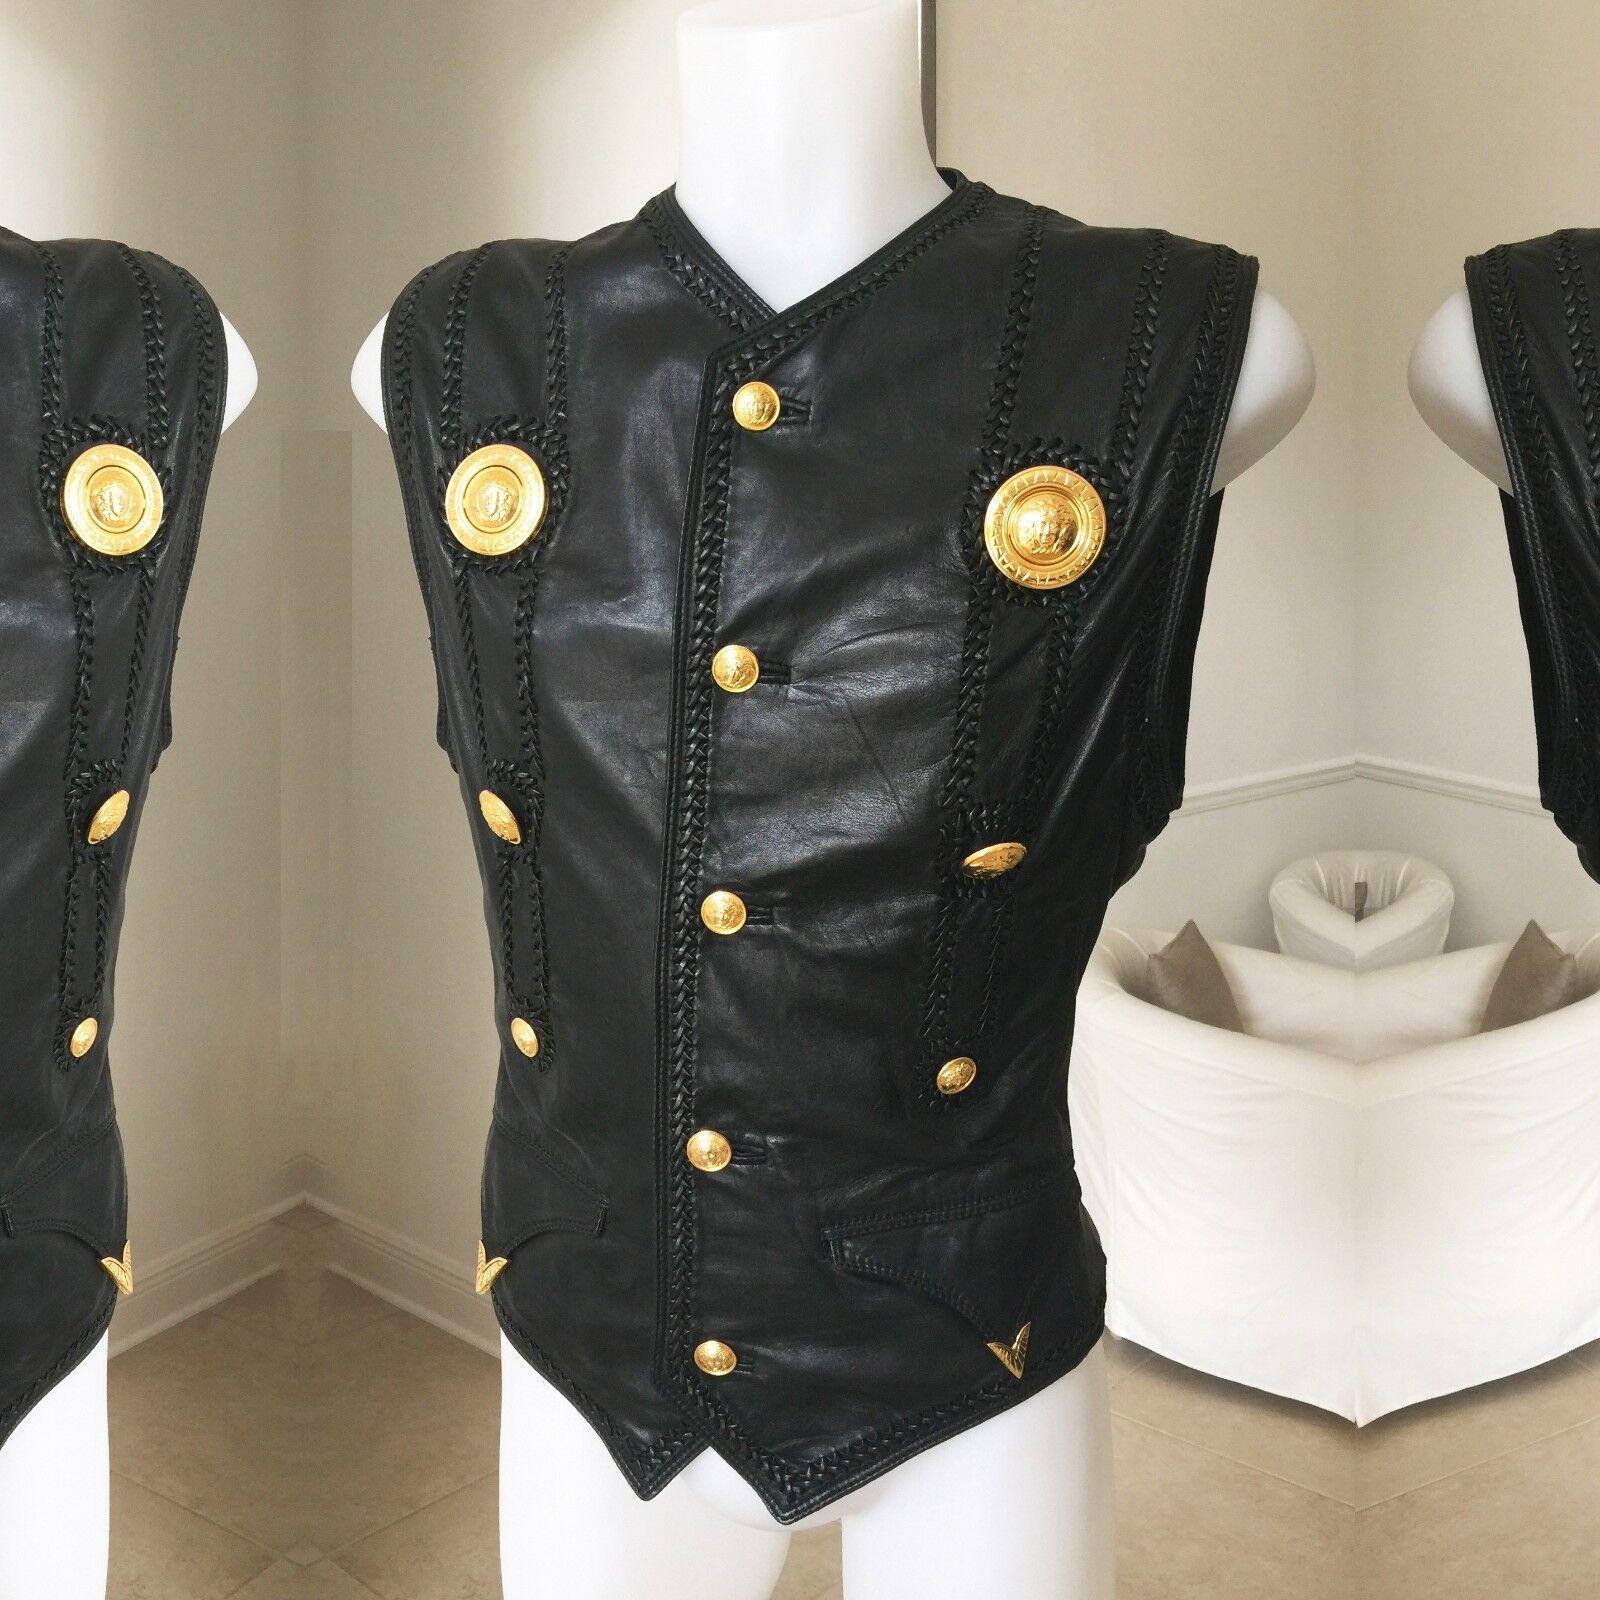 GIANNI VERSACE Leder with Medusa medallions bondage vest Italian Größe 52